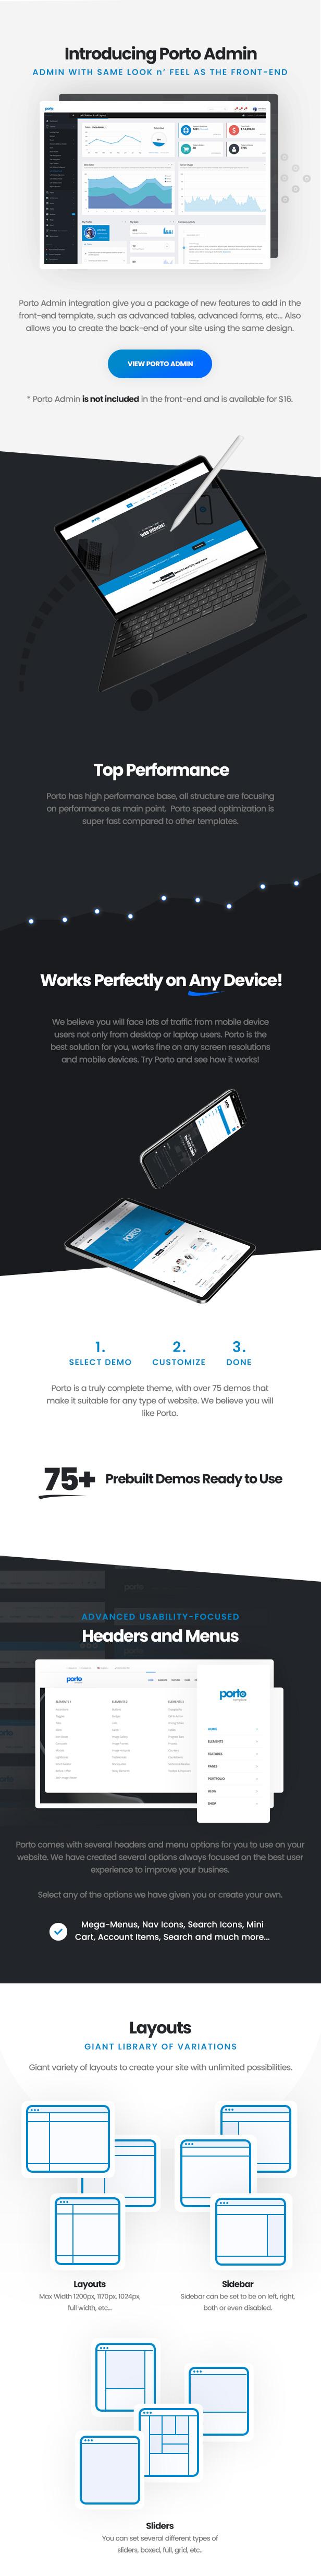 Porto - Responsive HTML5 Template - 2